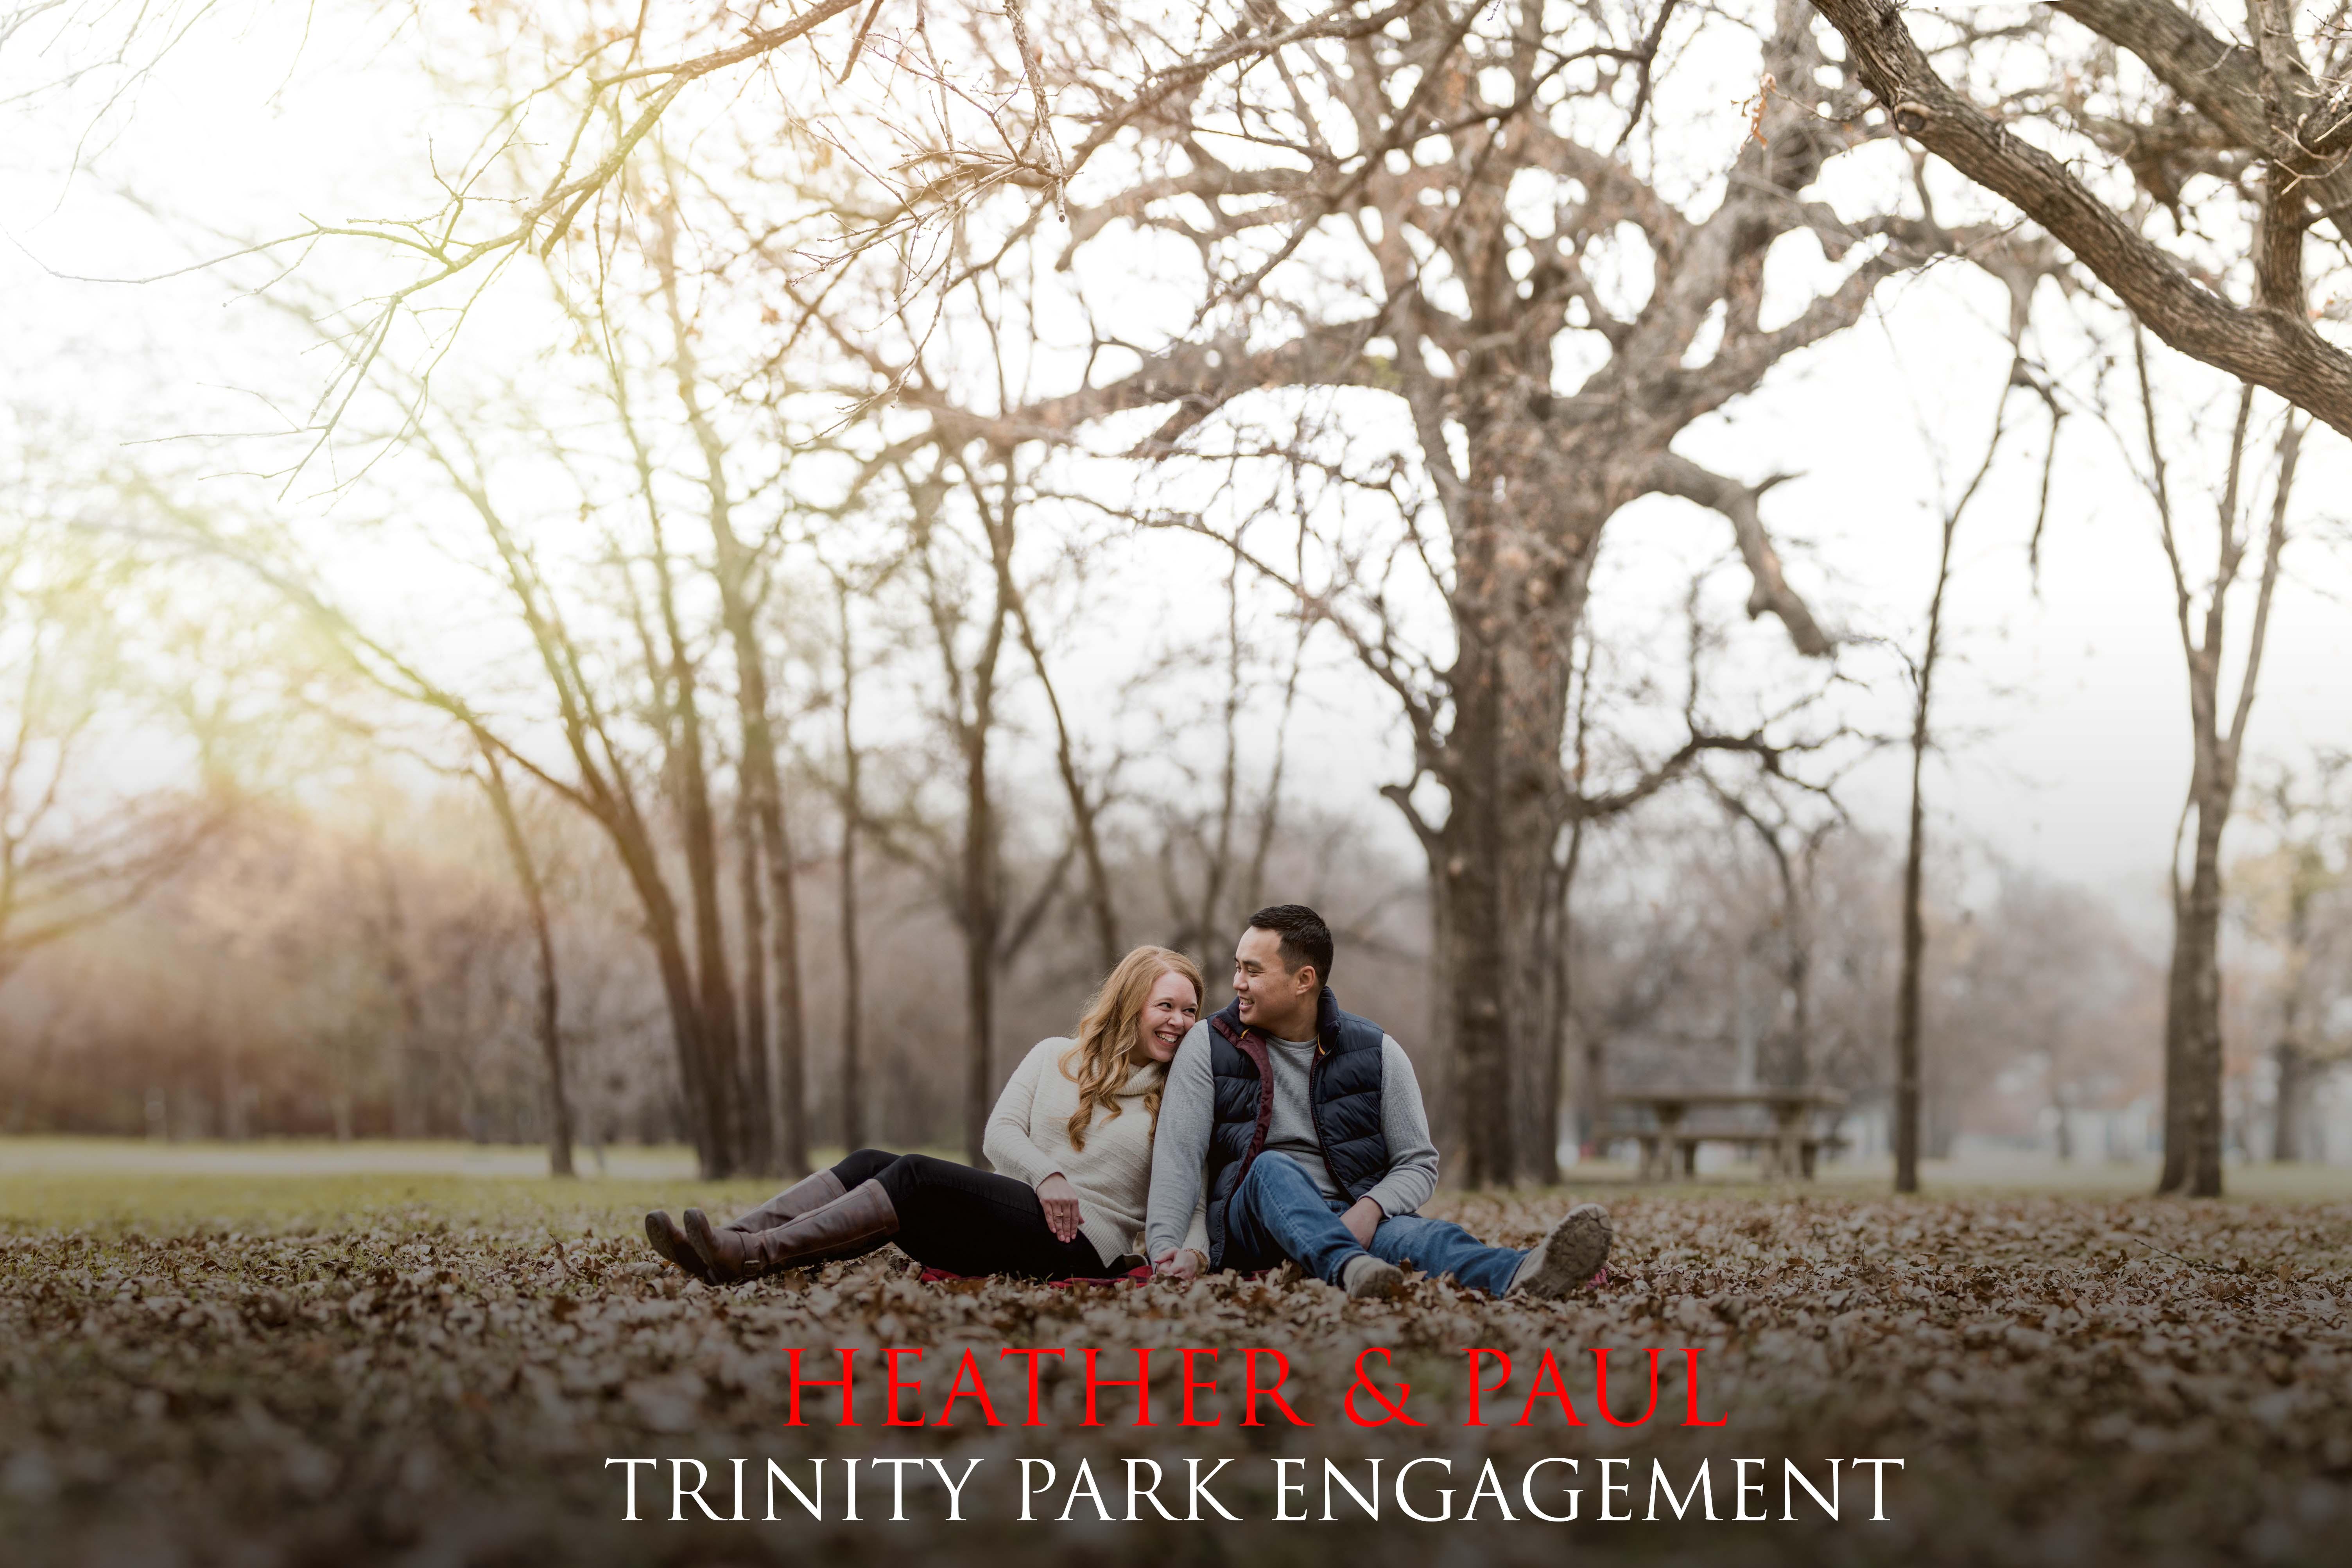 Trinity Park Engagement